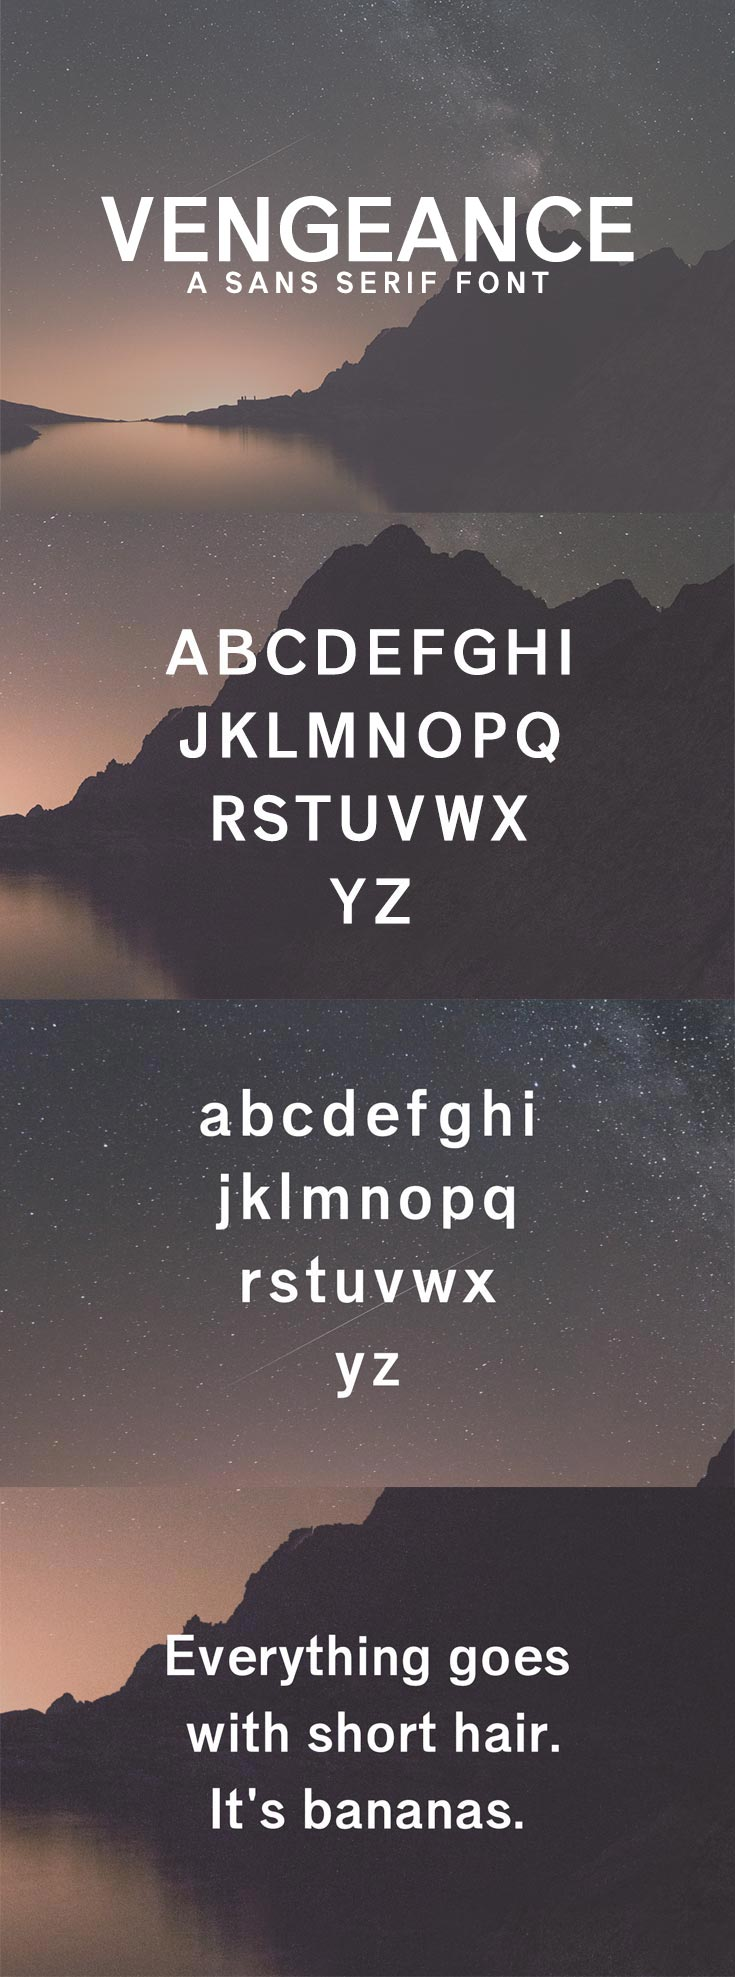 Free Vengeance Sans Serif Font